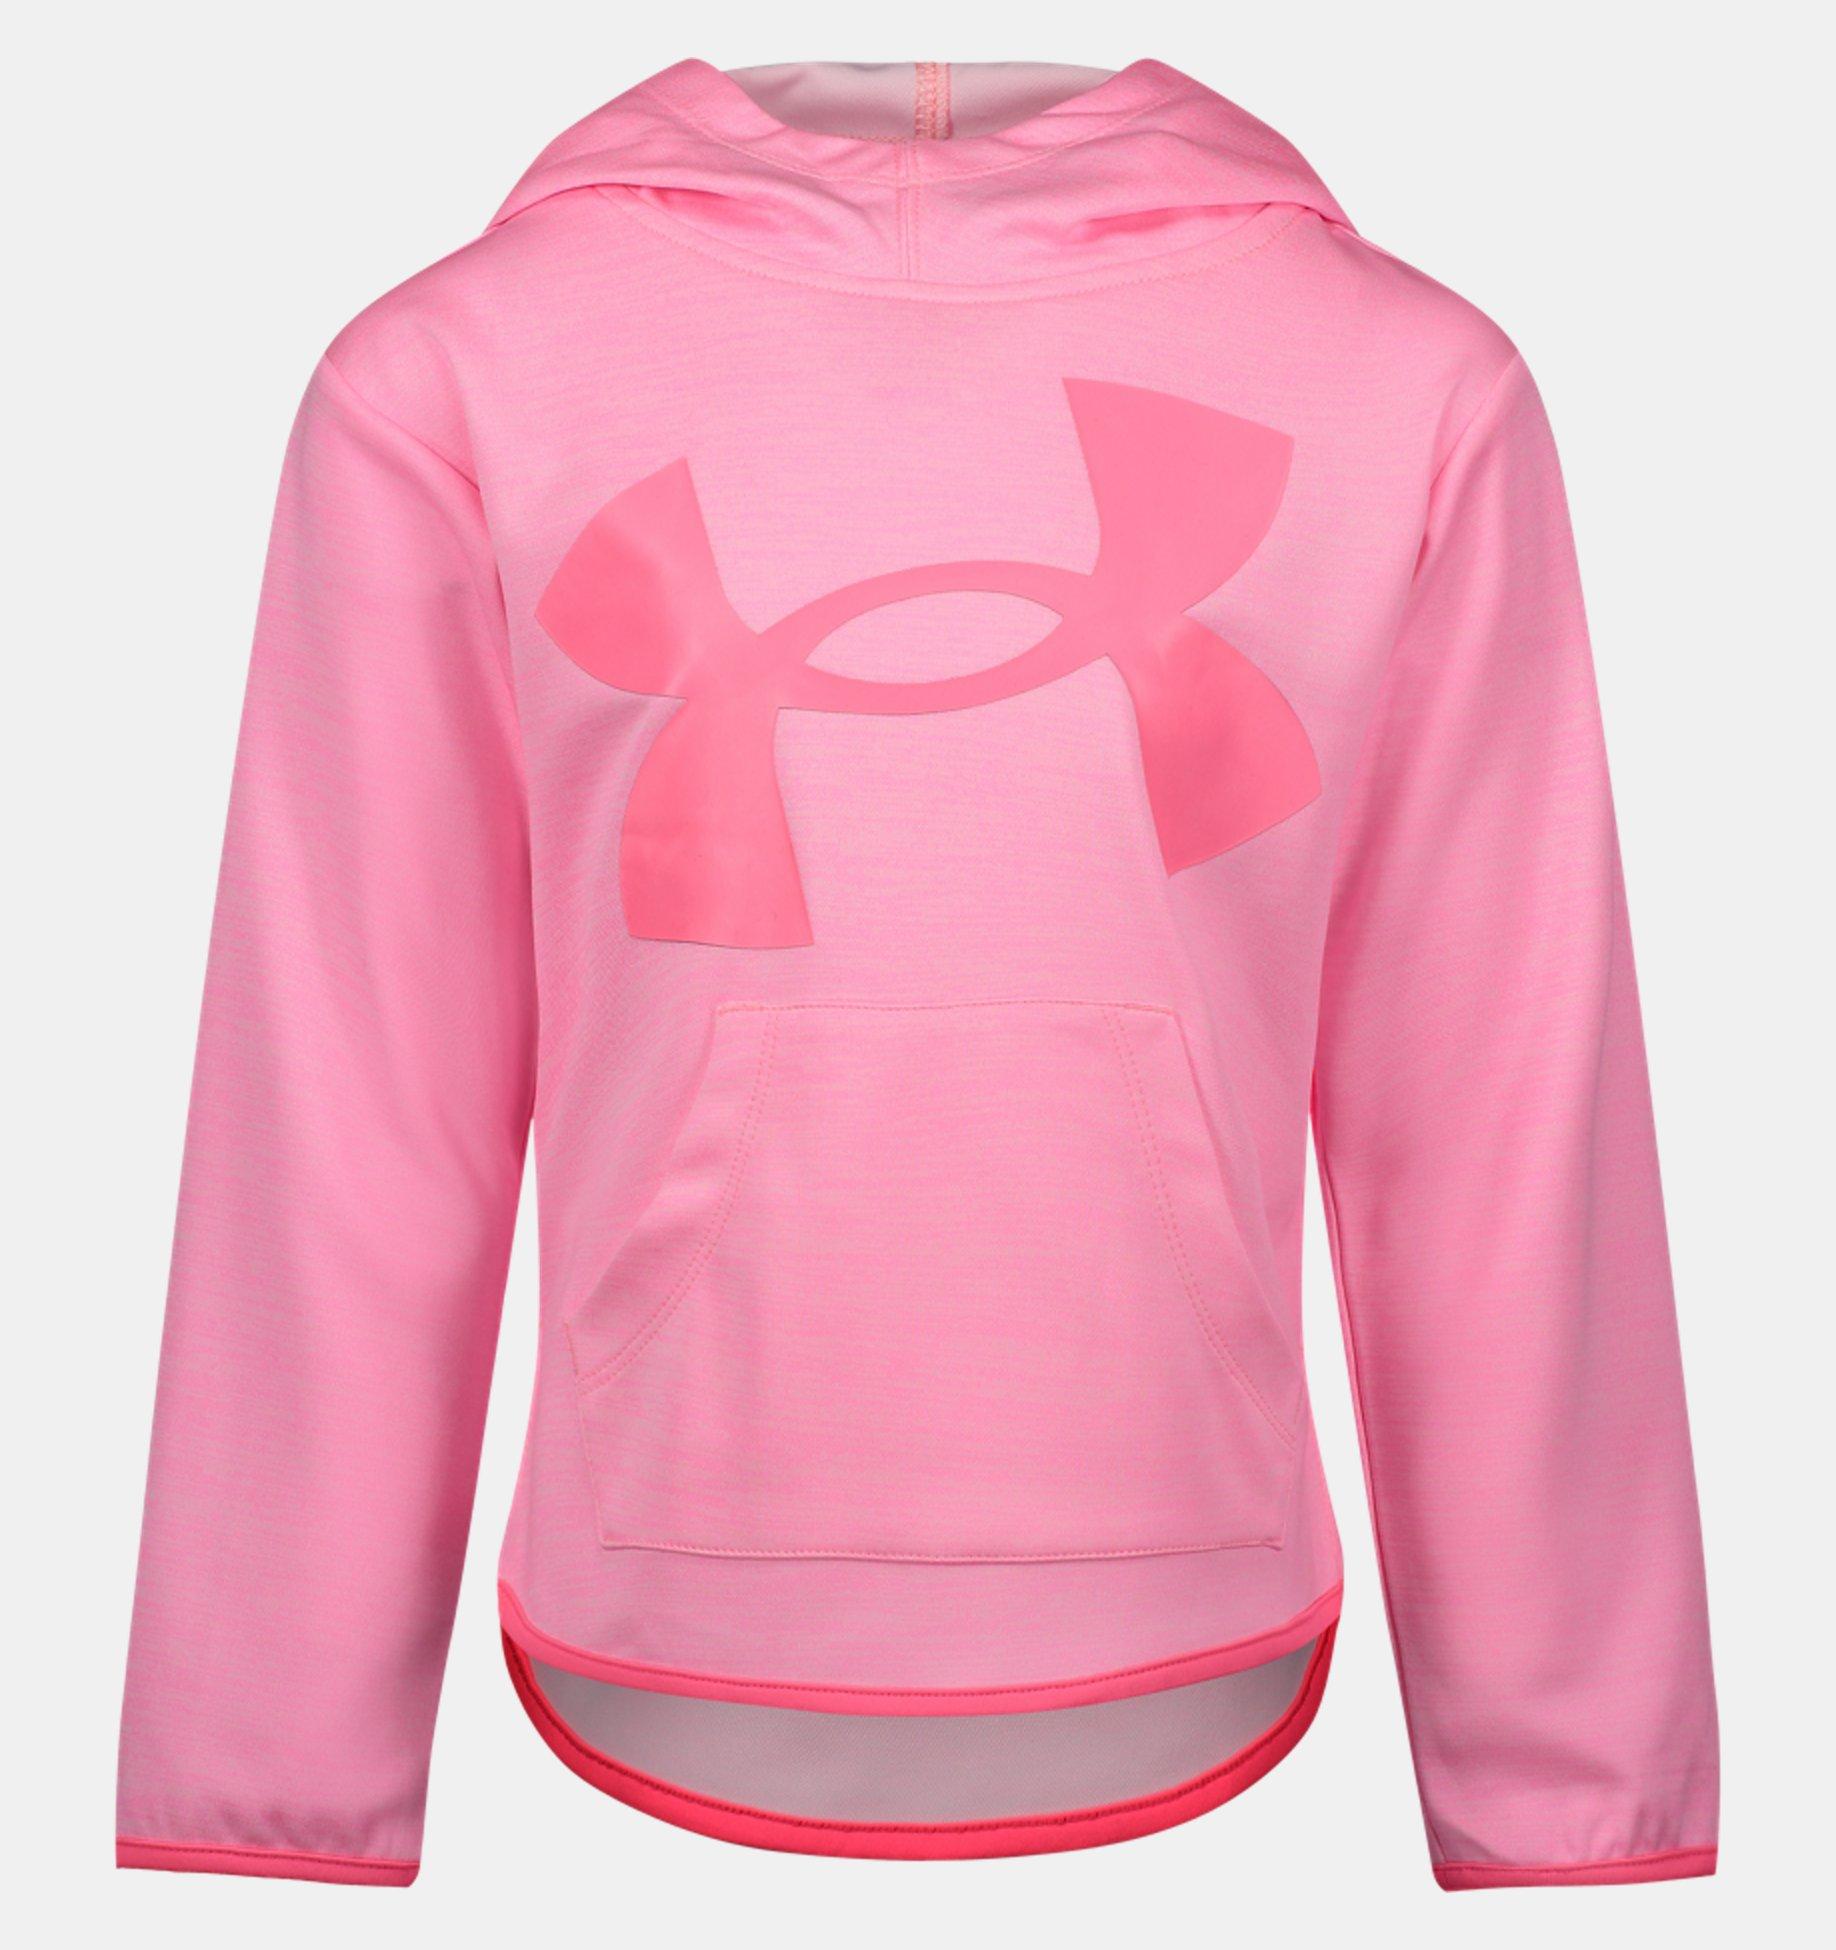 Underarmour Girls Pre-School UA Symbolic Twist Hoodie